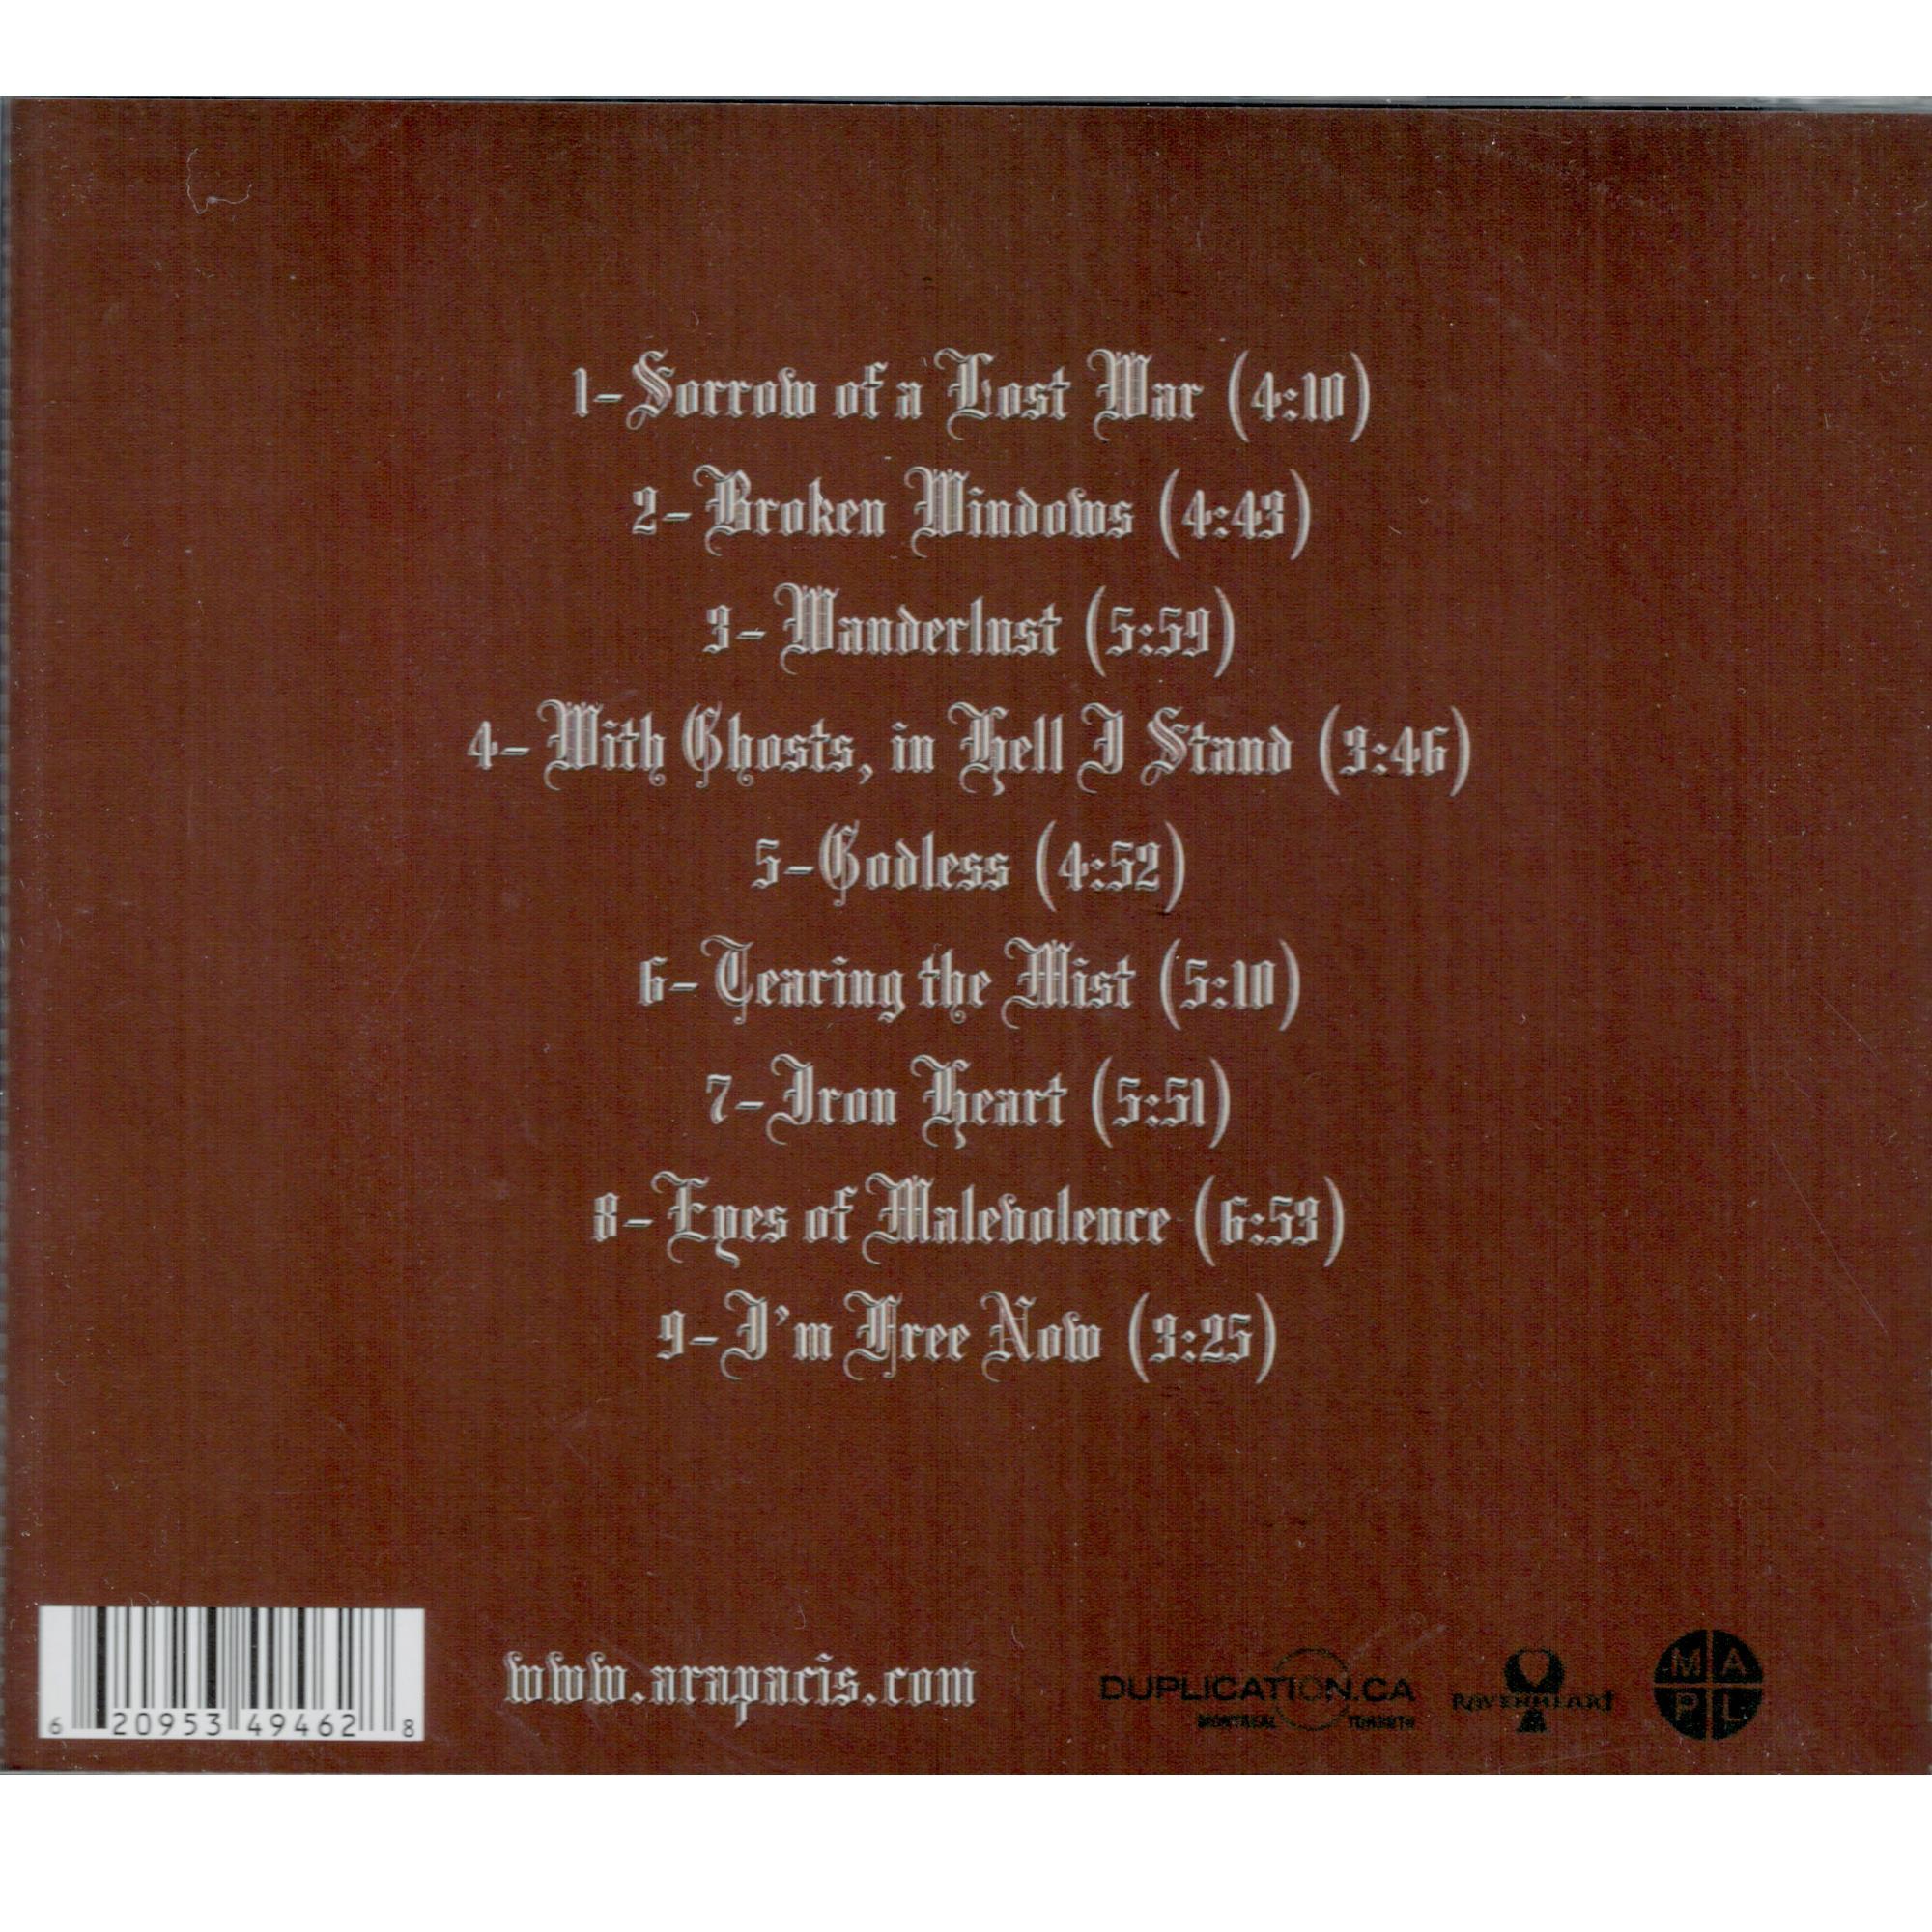 A Disturbing Awakening CD